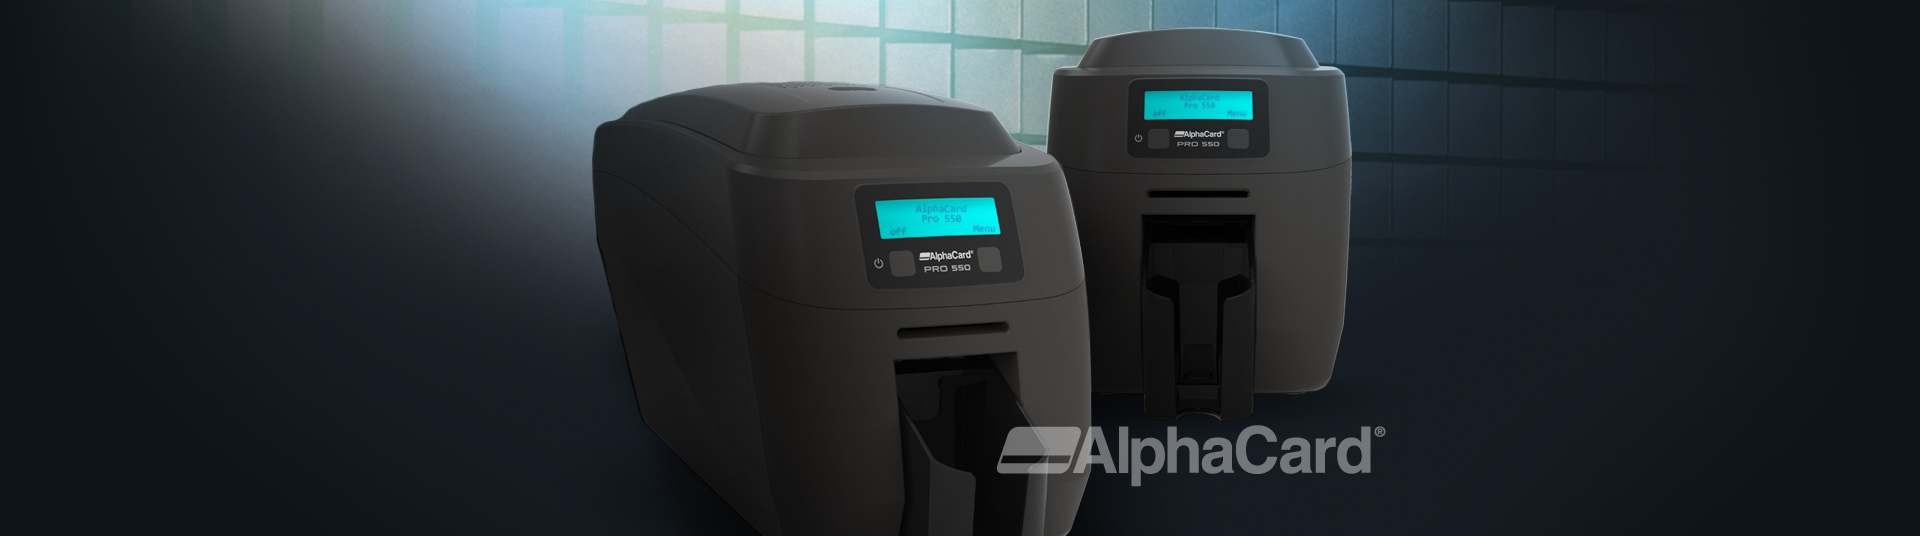 AlphaCard PRO 550 ID Card Printers